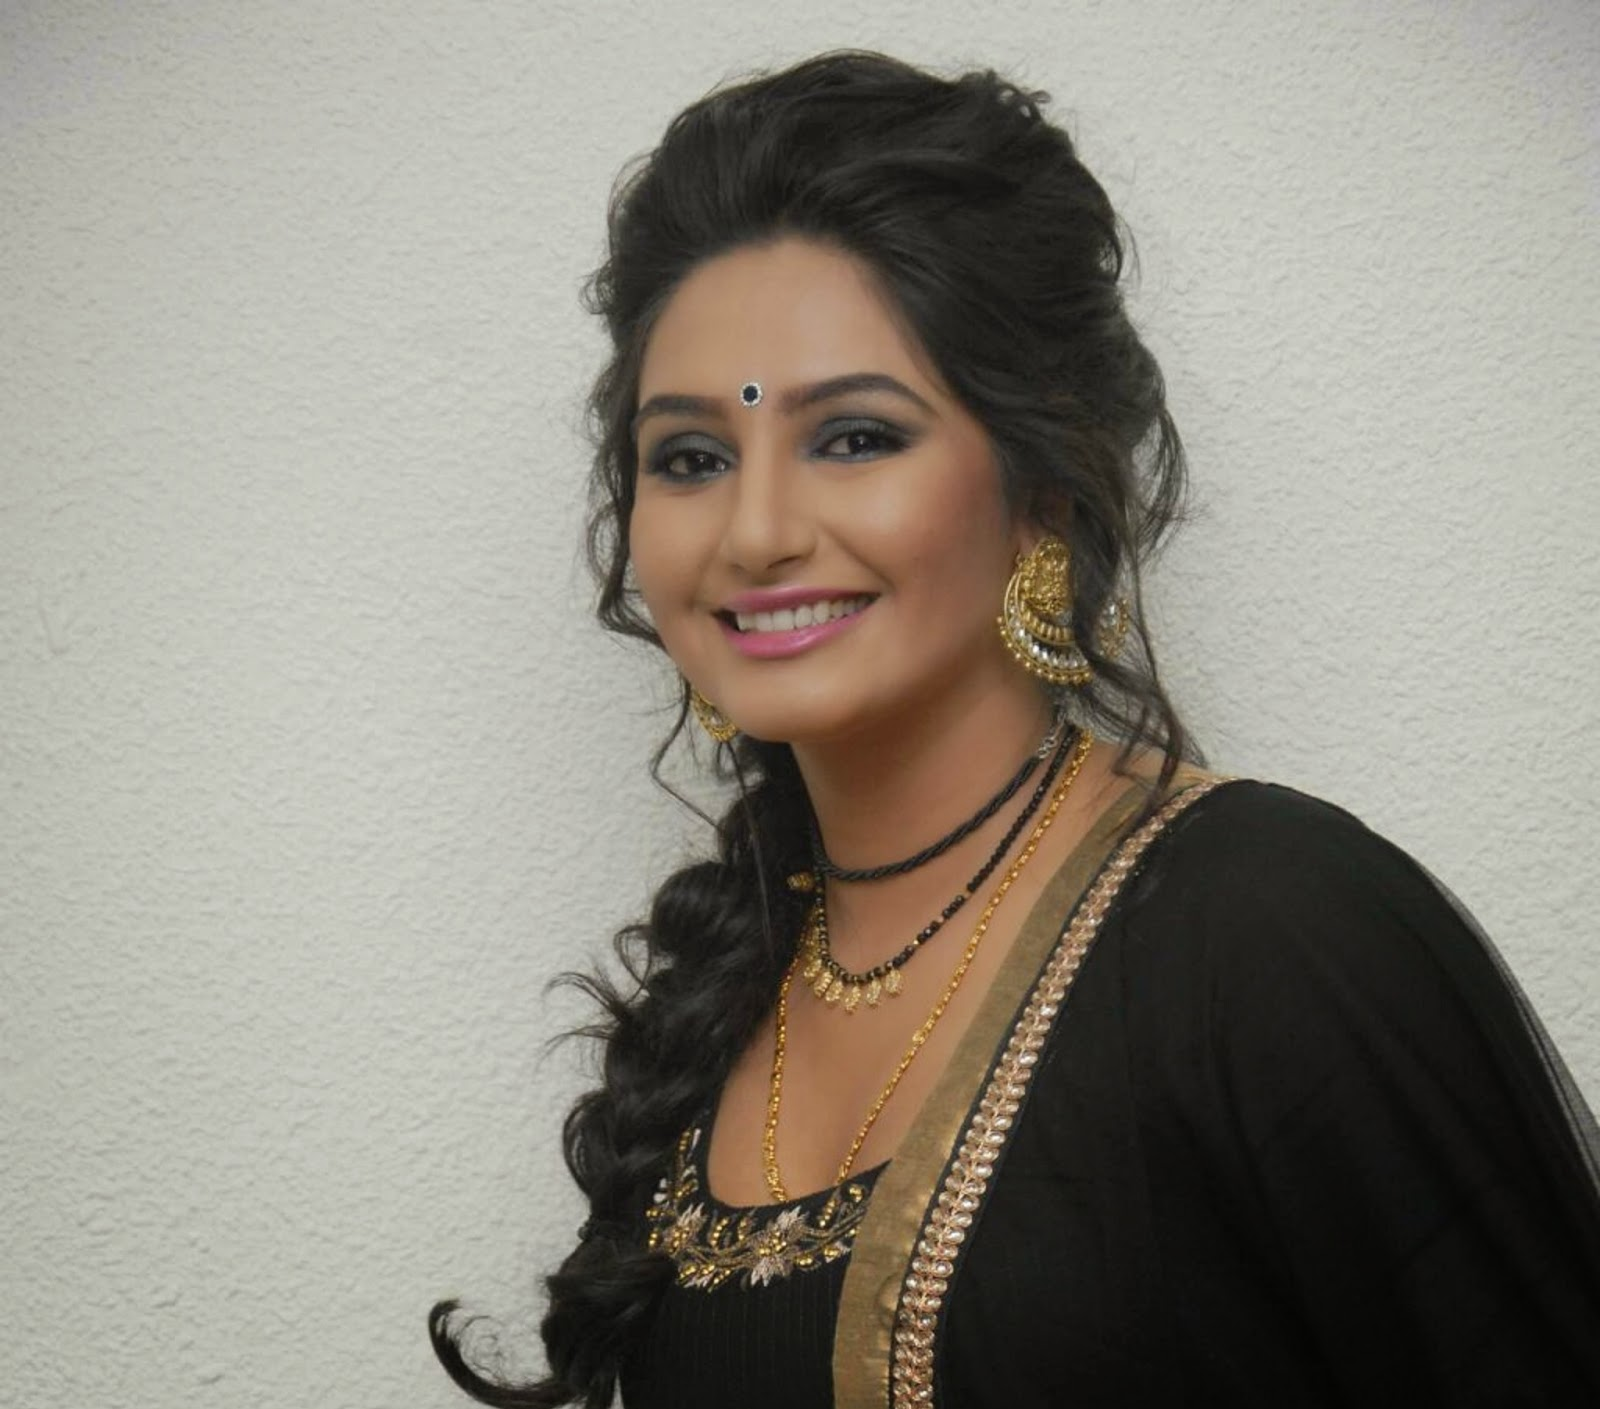 Free Download HD Wallpapers: Ragini Dwivedi HD Wallpapers